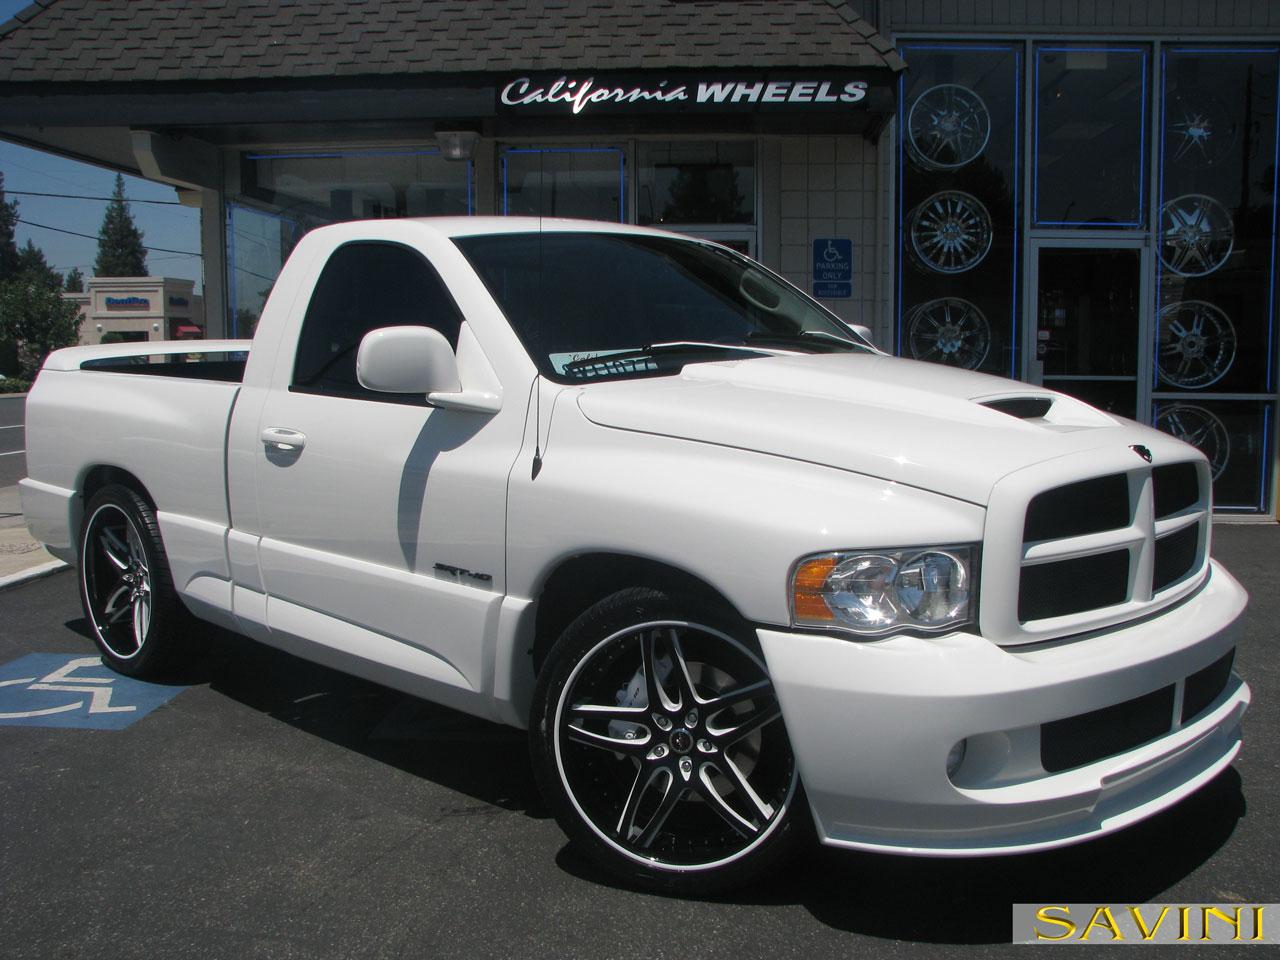 White Dodge Ram Srt10 Savini Forged Wheels Sv2